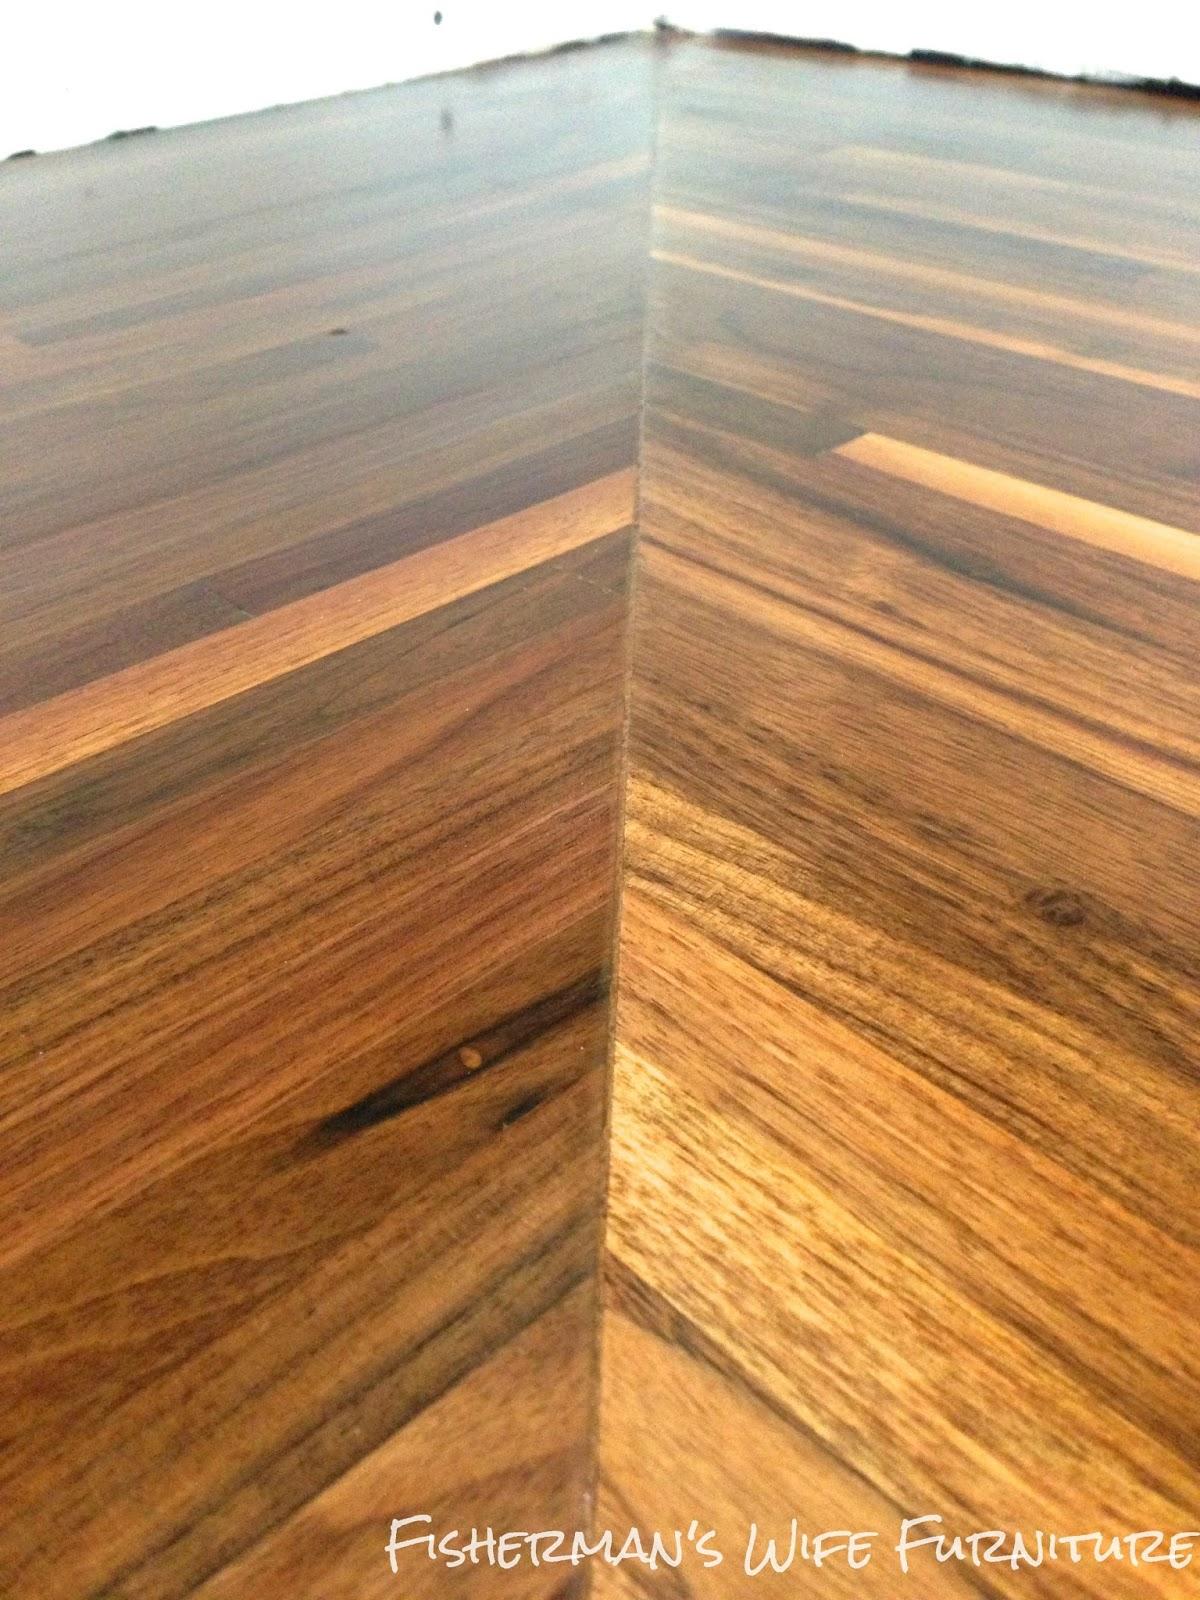 diy butcher block countertops. Black Bedroom Furniture Sets. Home Design Ideas